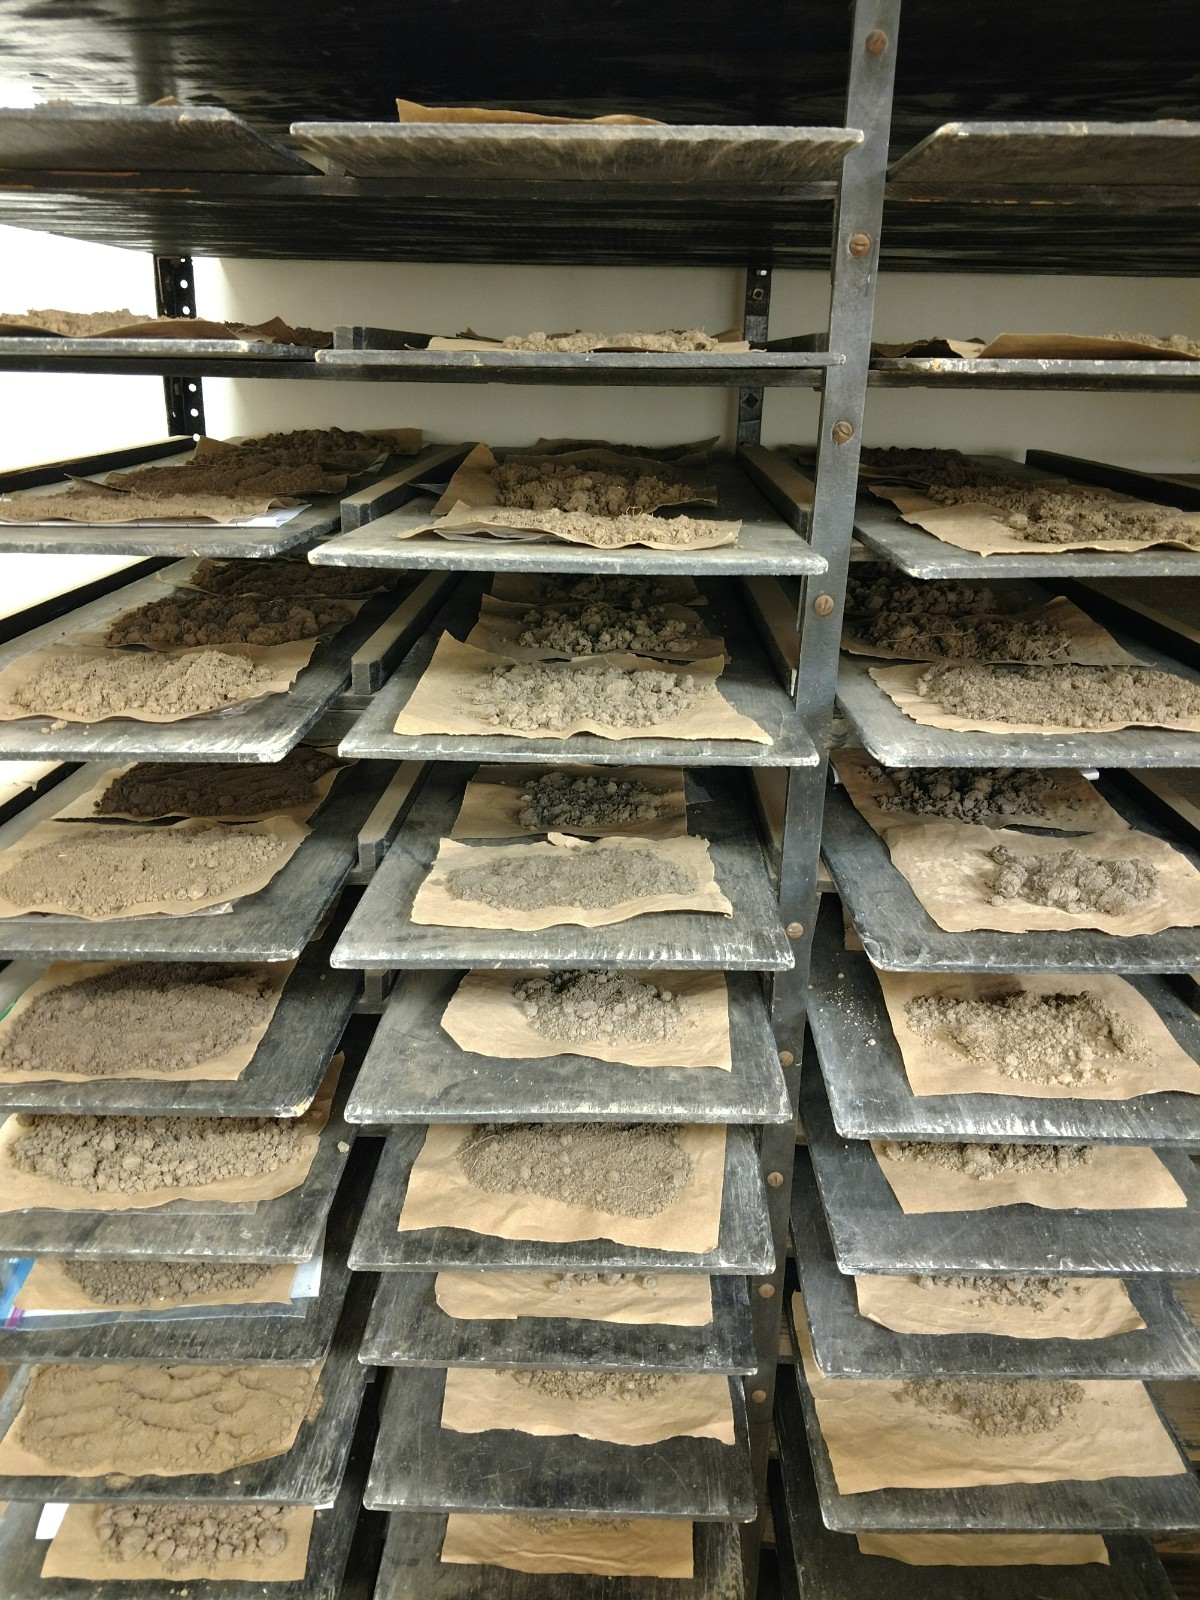 1. Spread soils on drying rack